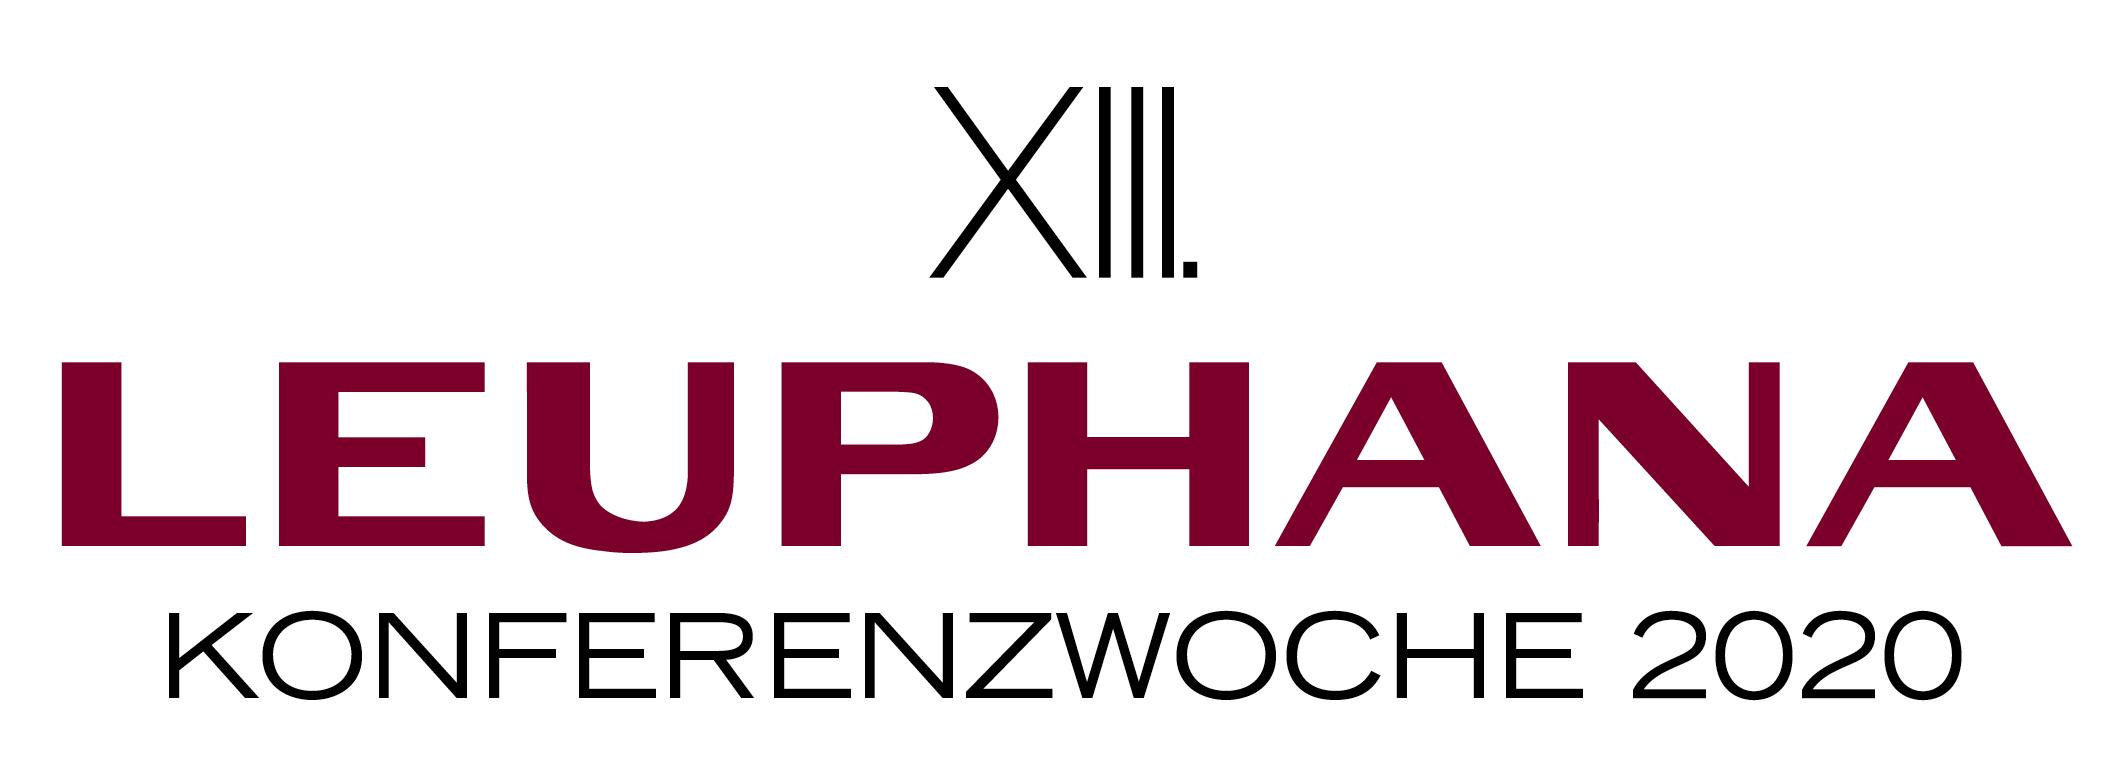 13. Leuphana-Konferenzwoche